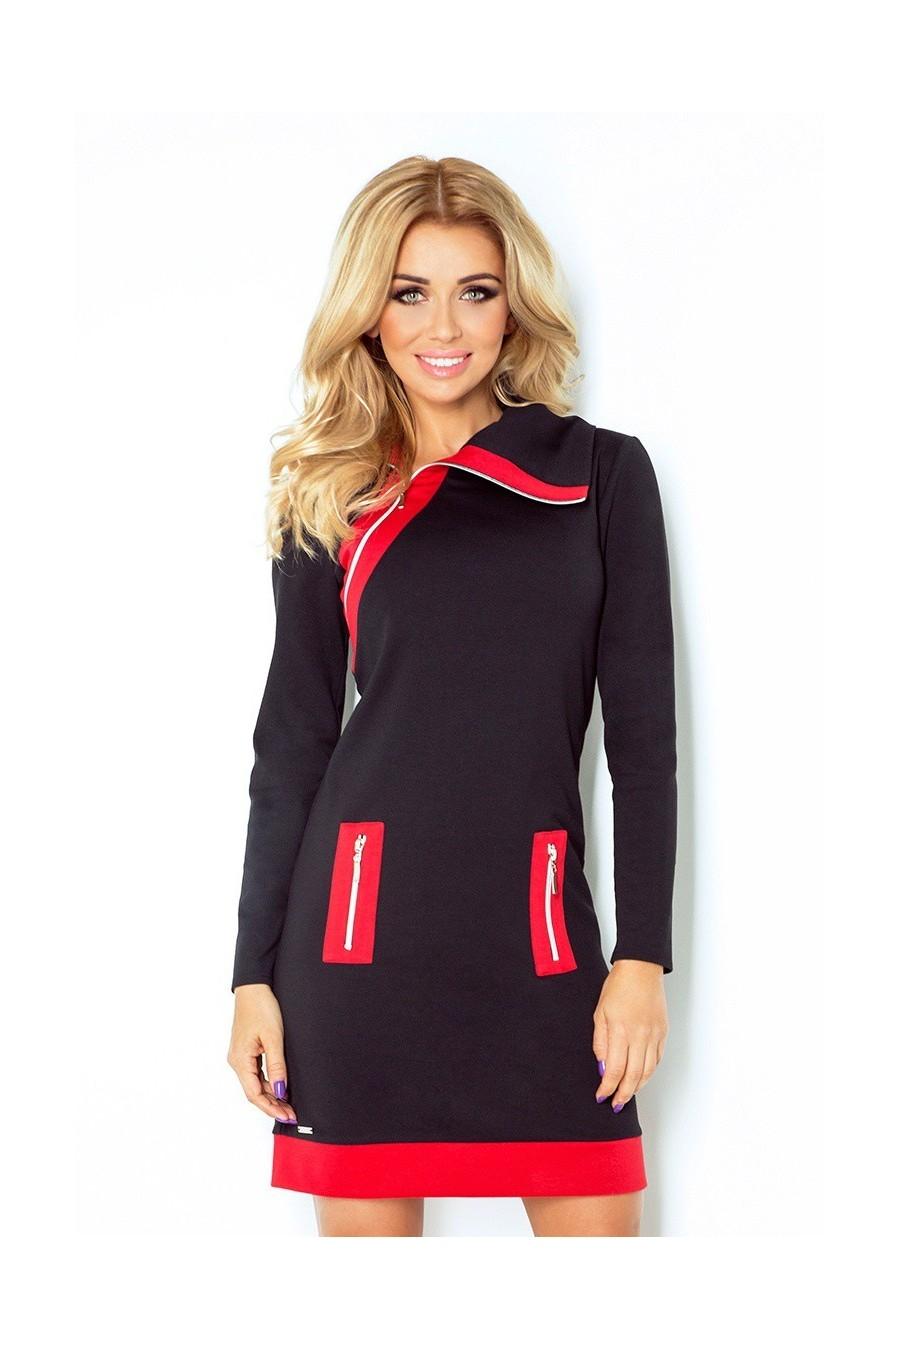 2d21baef9bf3 Dámske šaty na zips s rukávom 2670 - Spoločenské šaty Online